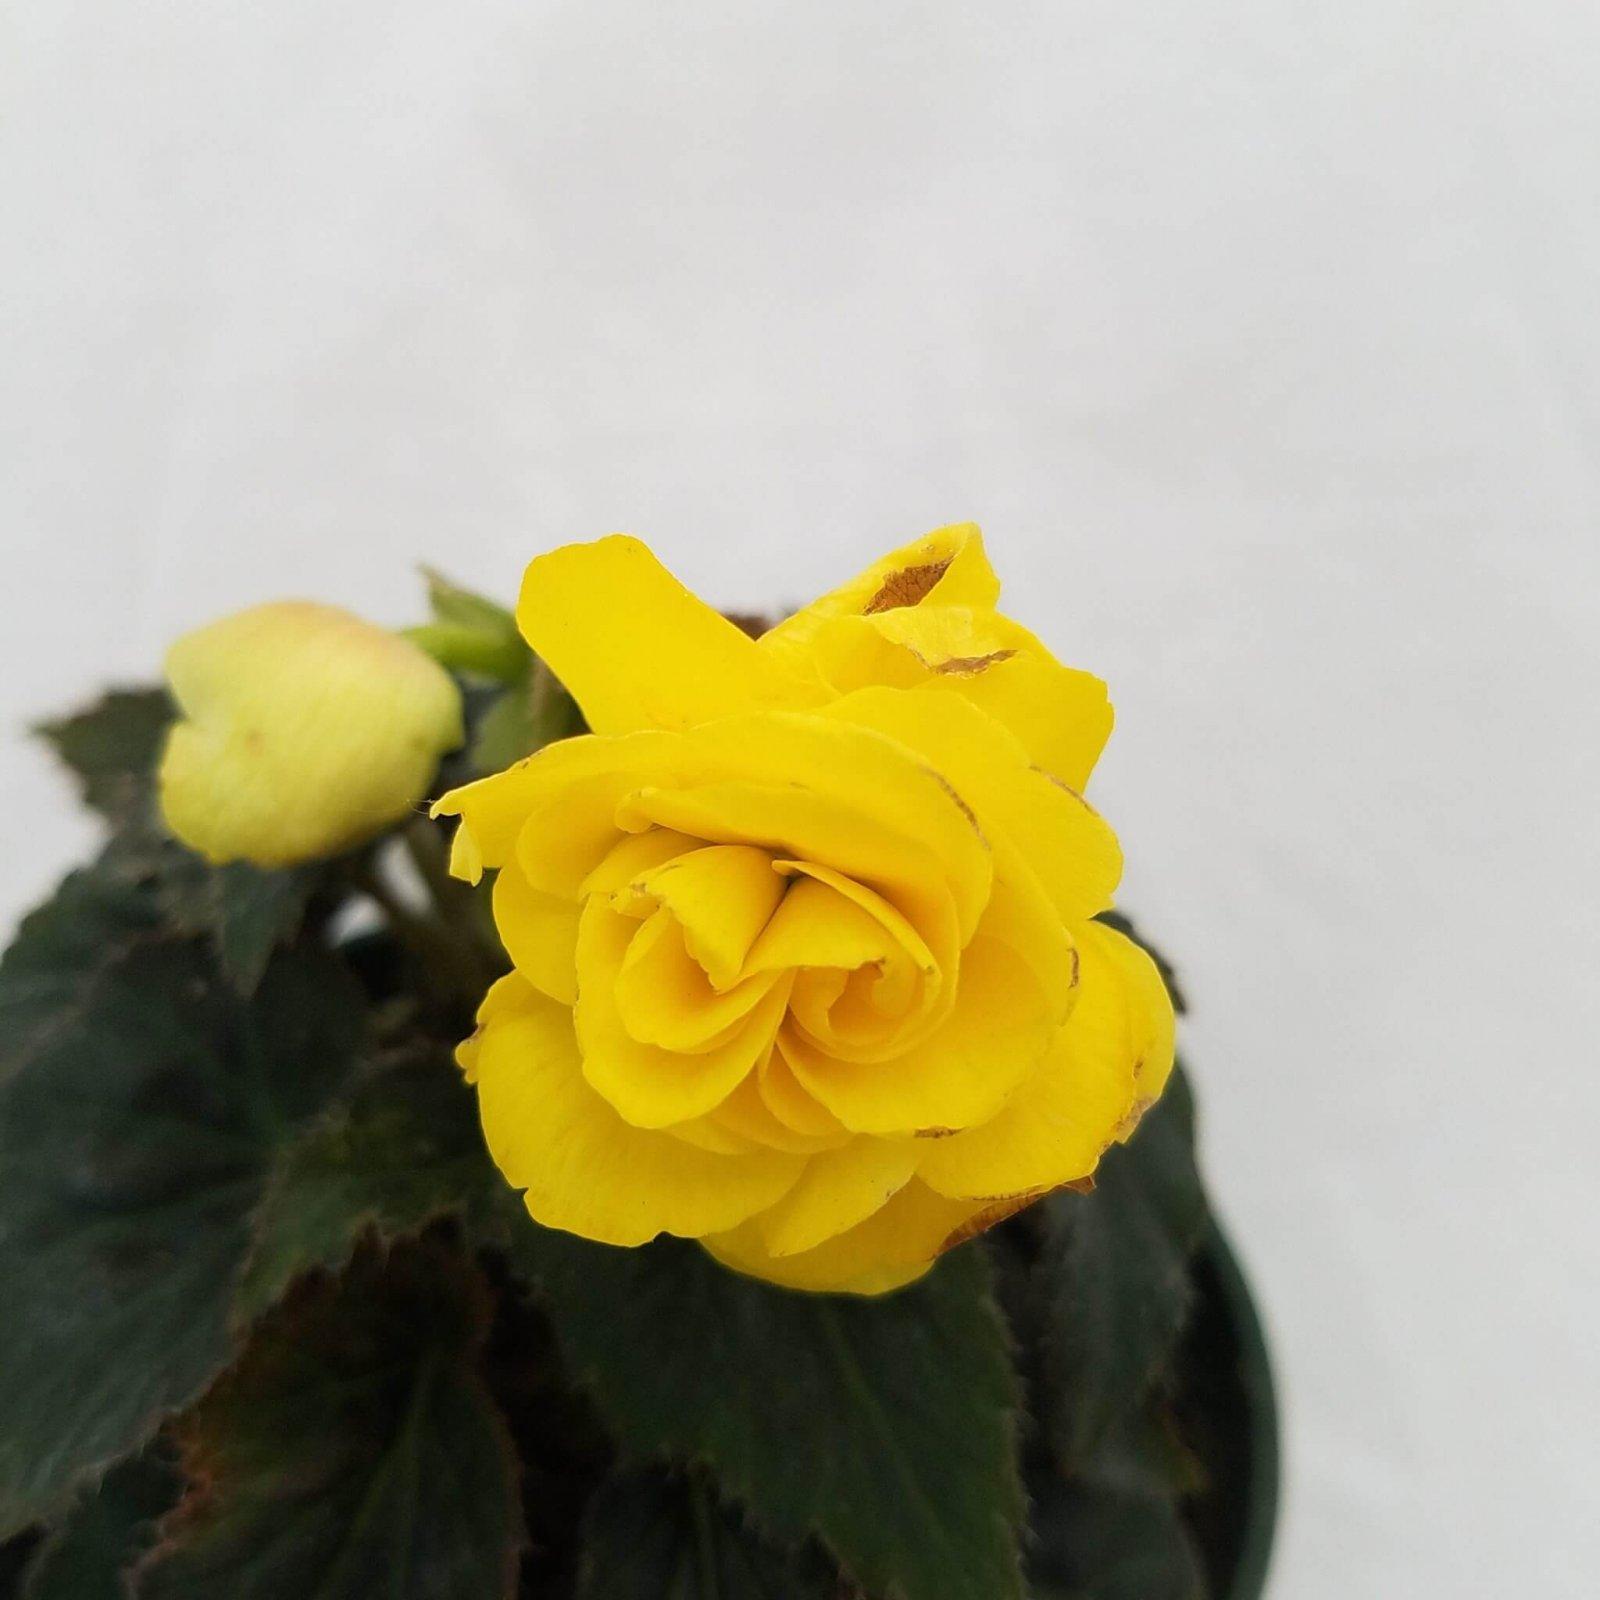 Begonia tuberosa 'Nonstop Yellow' - 4 1/2